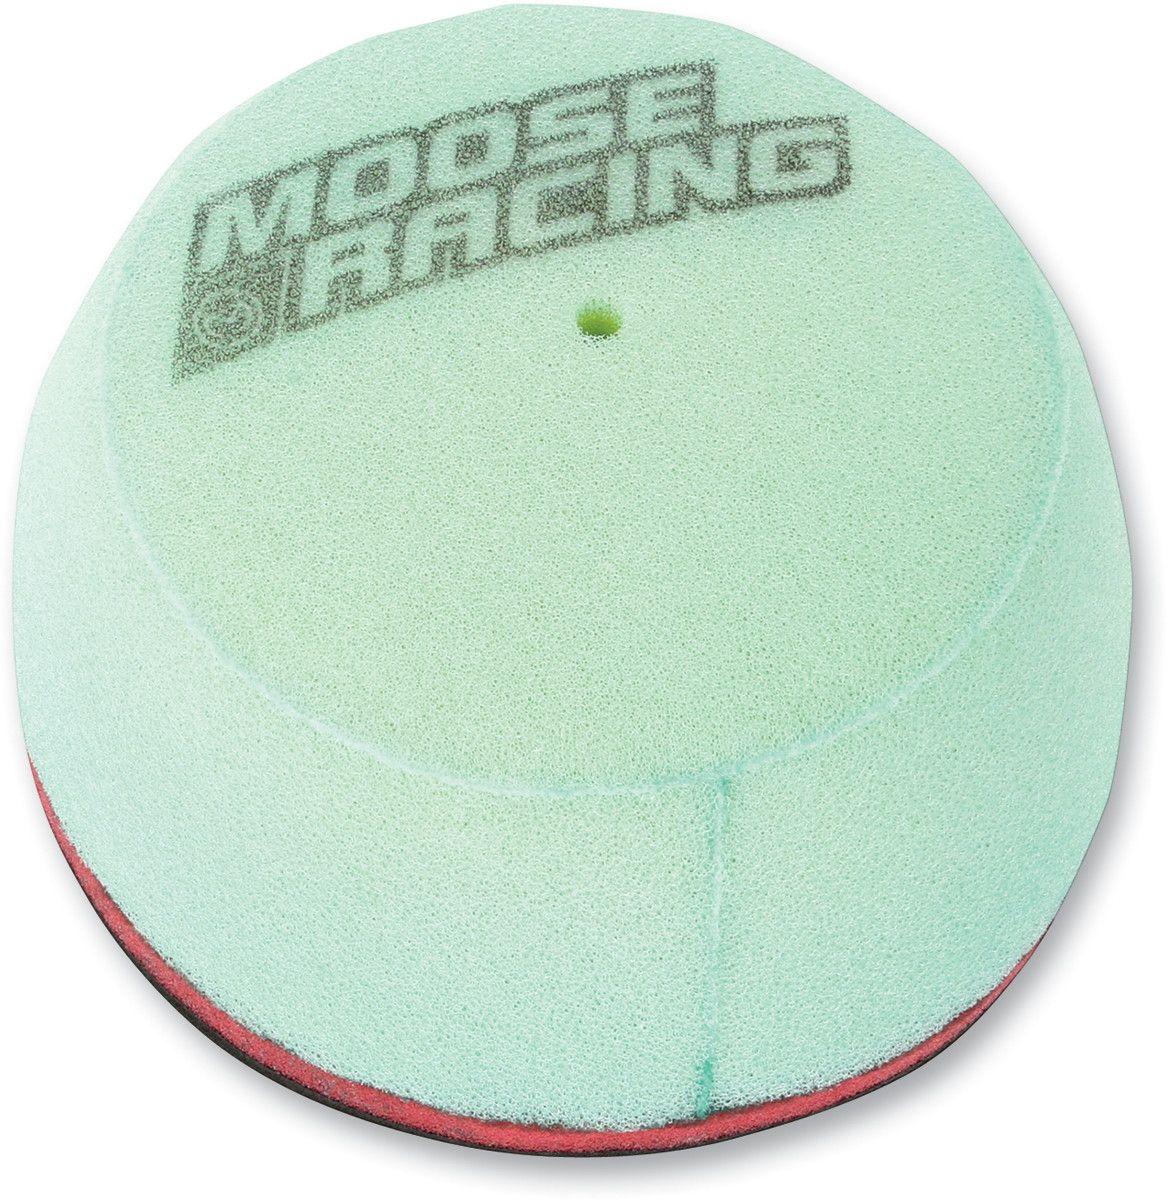 【MOOSE RACING】PRECISION PRE-OILED 空氣濾芯 [1011-0844] - 「Webike-摩托百貨」